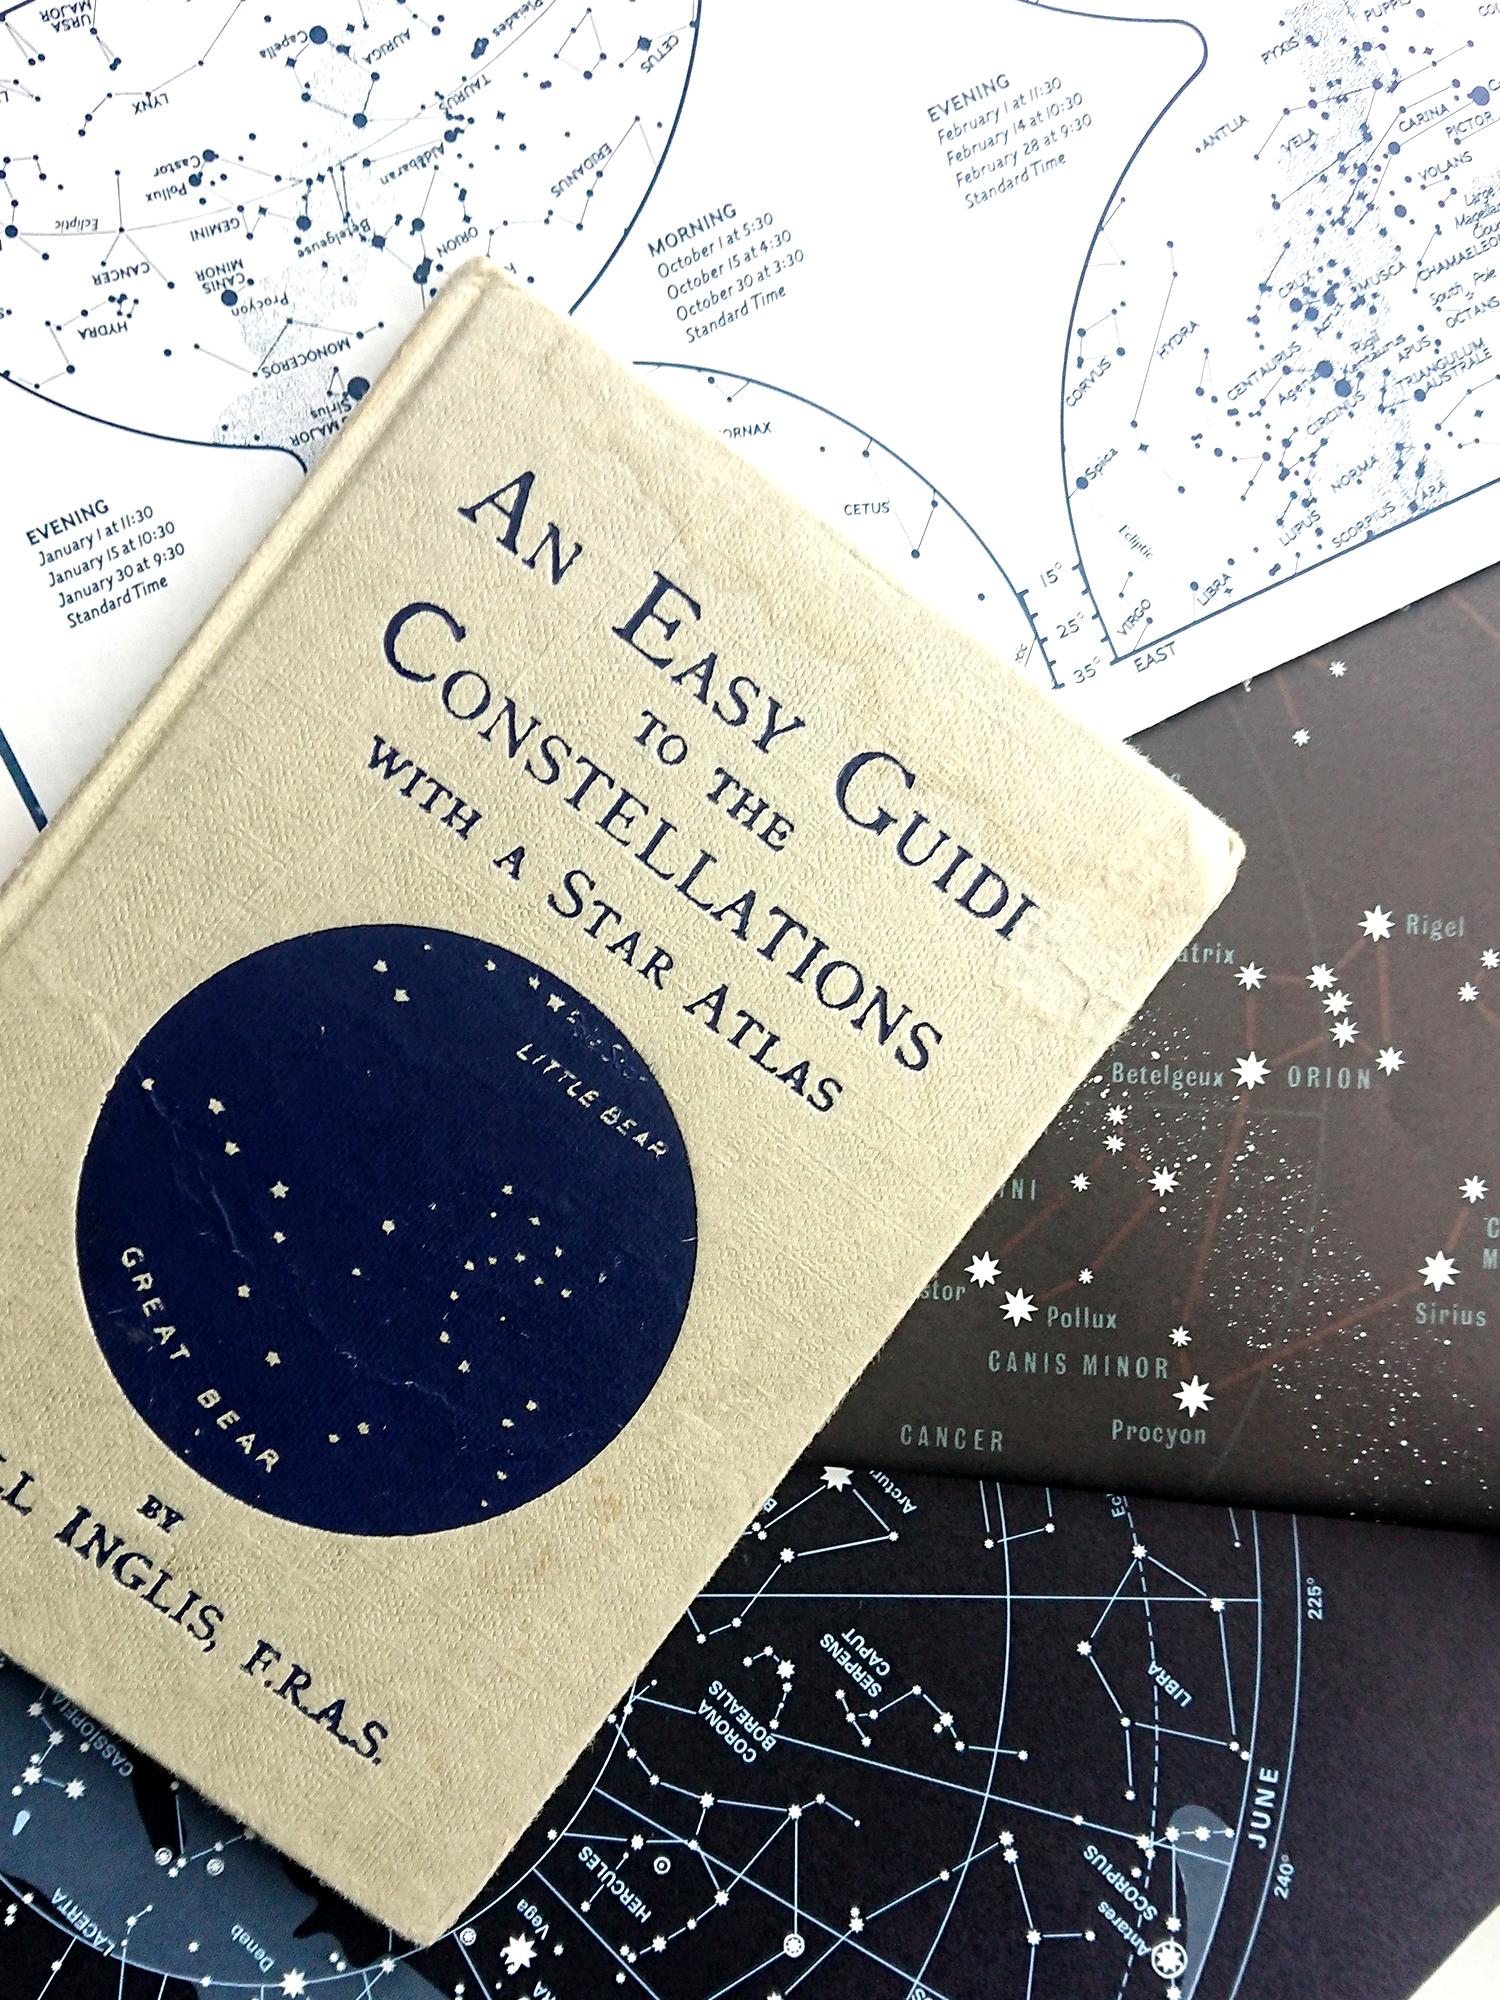 celestial maps of heaven